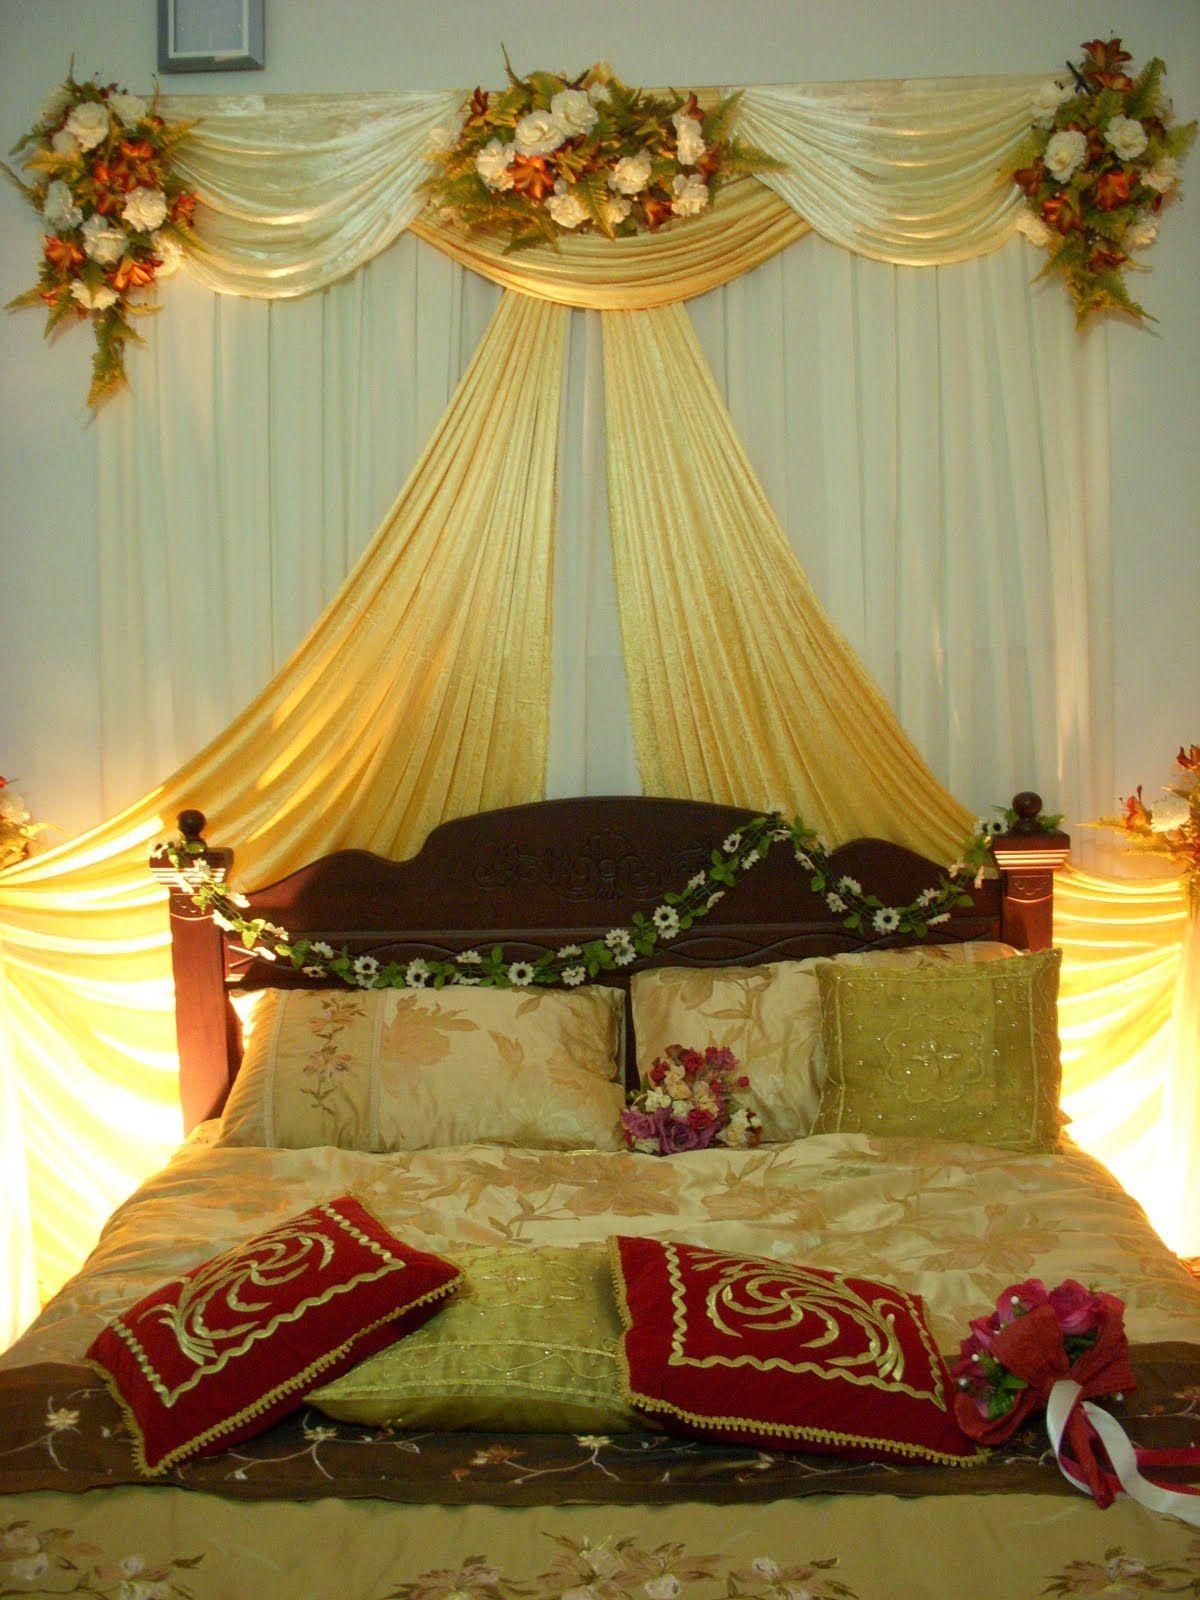 Bridal Room Designs Wedding Room Decorations Modern Minimalist Ideas 1200x1600 In 222 2kb Dekor Kamar Tidur